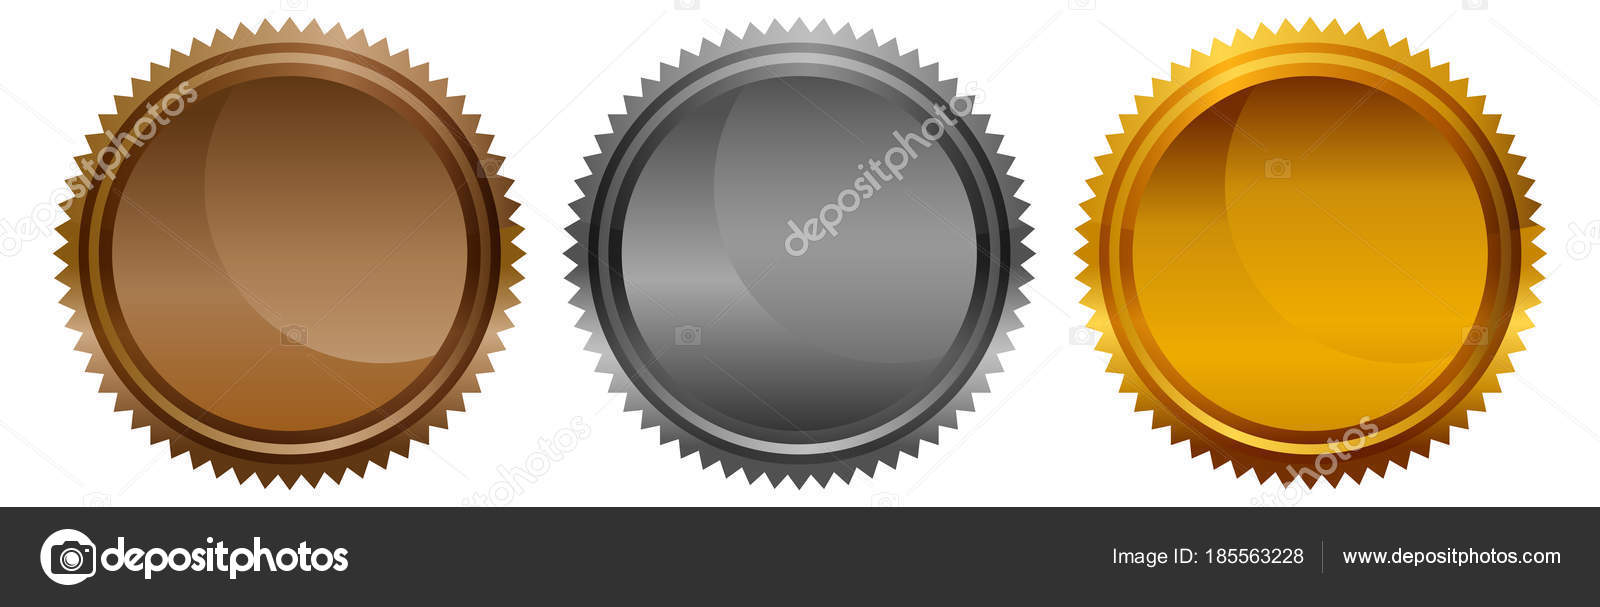 Leere Metall Bronze Gold Silber Stern Runde Münze Medaillen ...